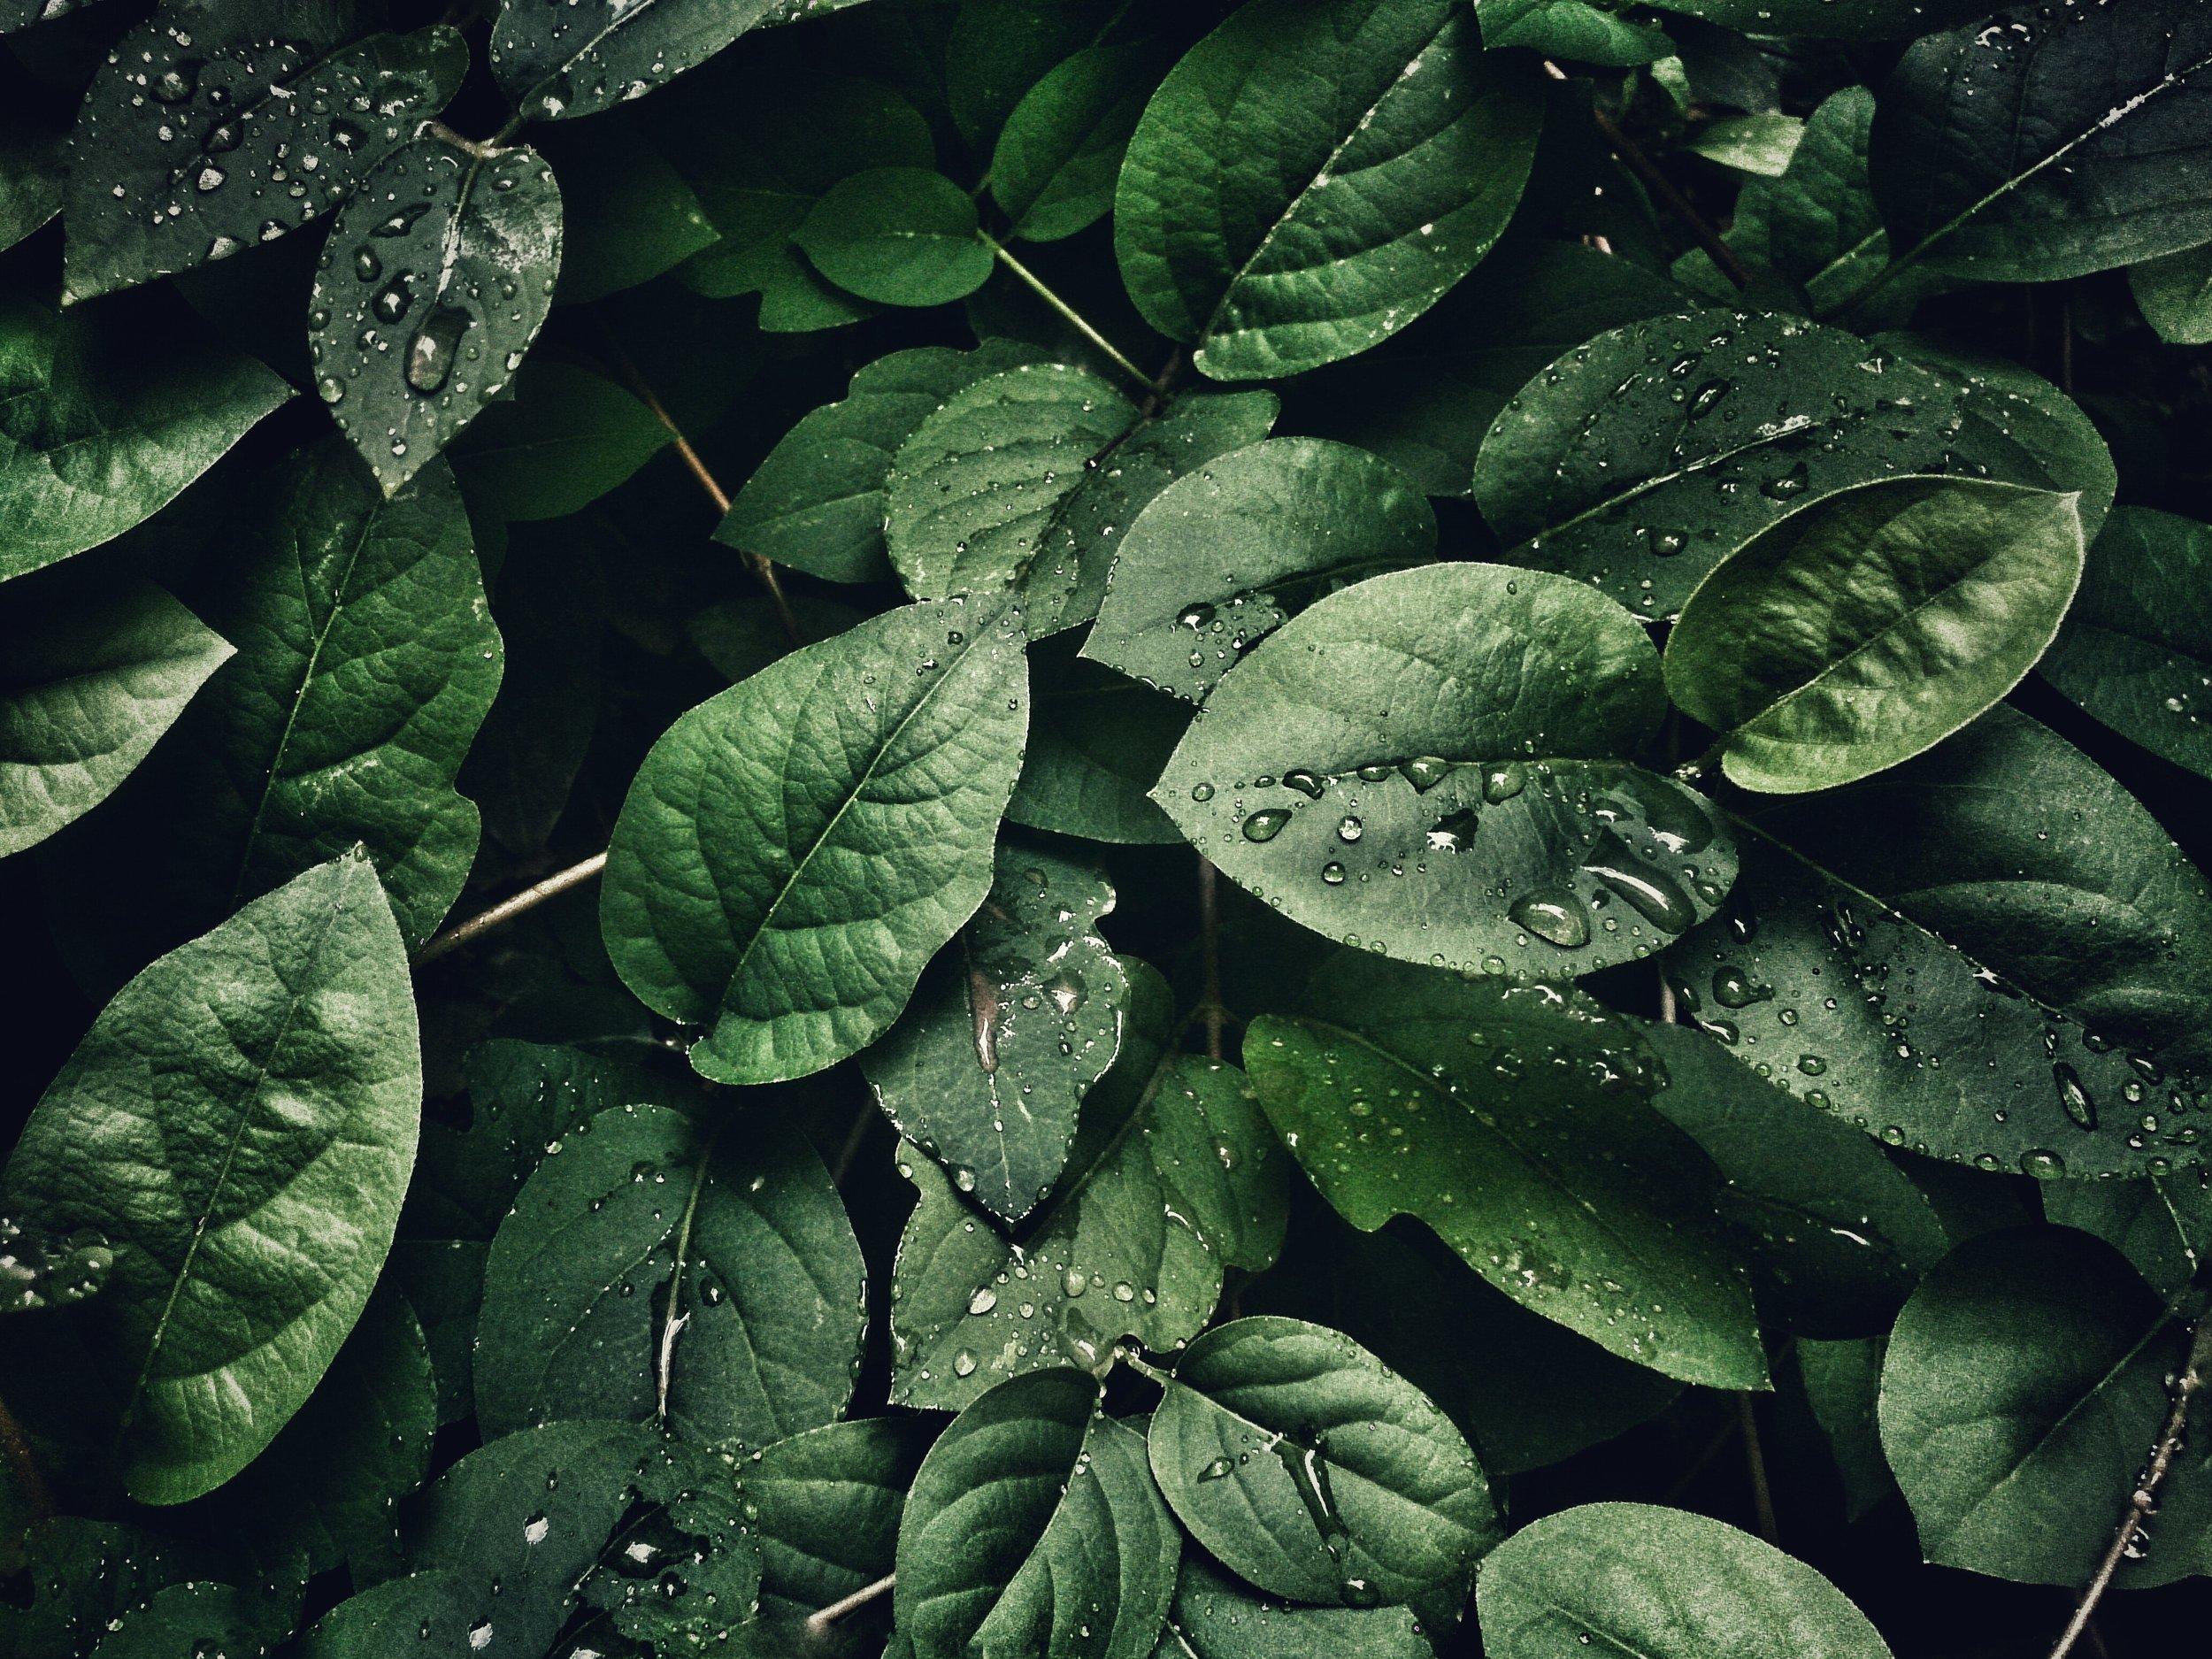 mobilechallenge-close-up-dew-807598.jpg